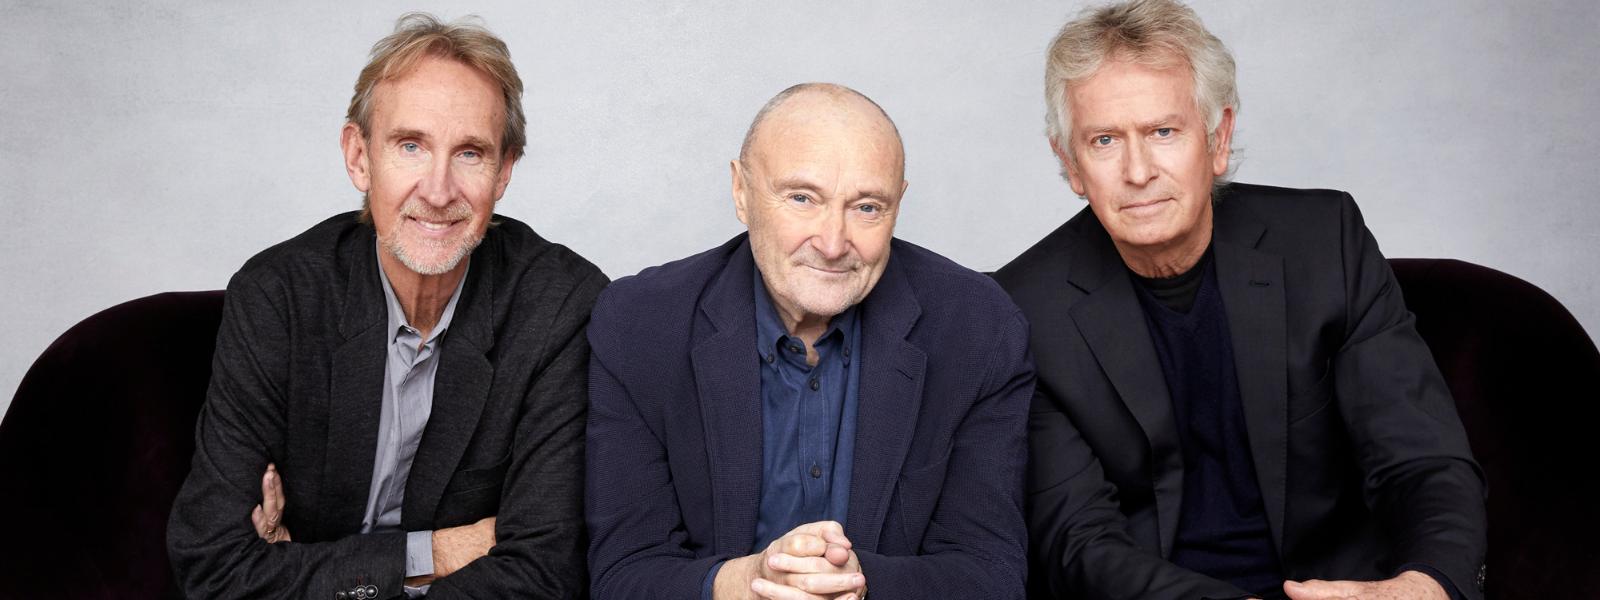 Genesis: The Last Domino? Tour